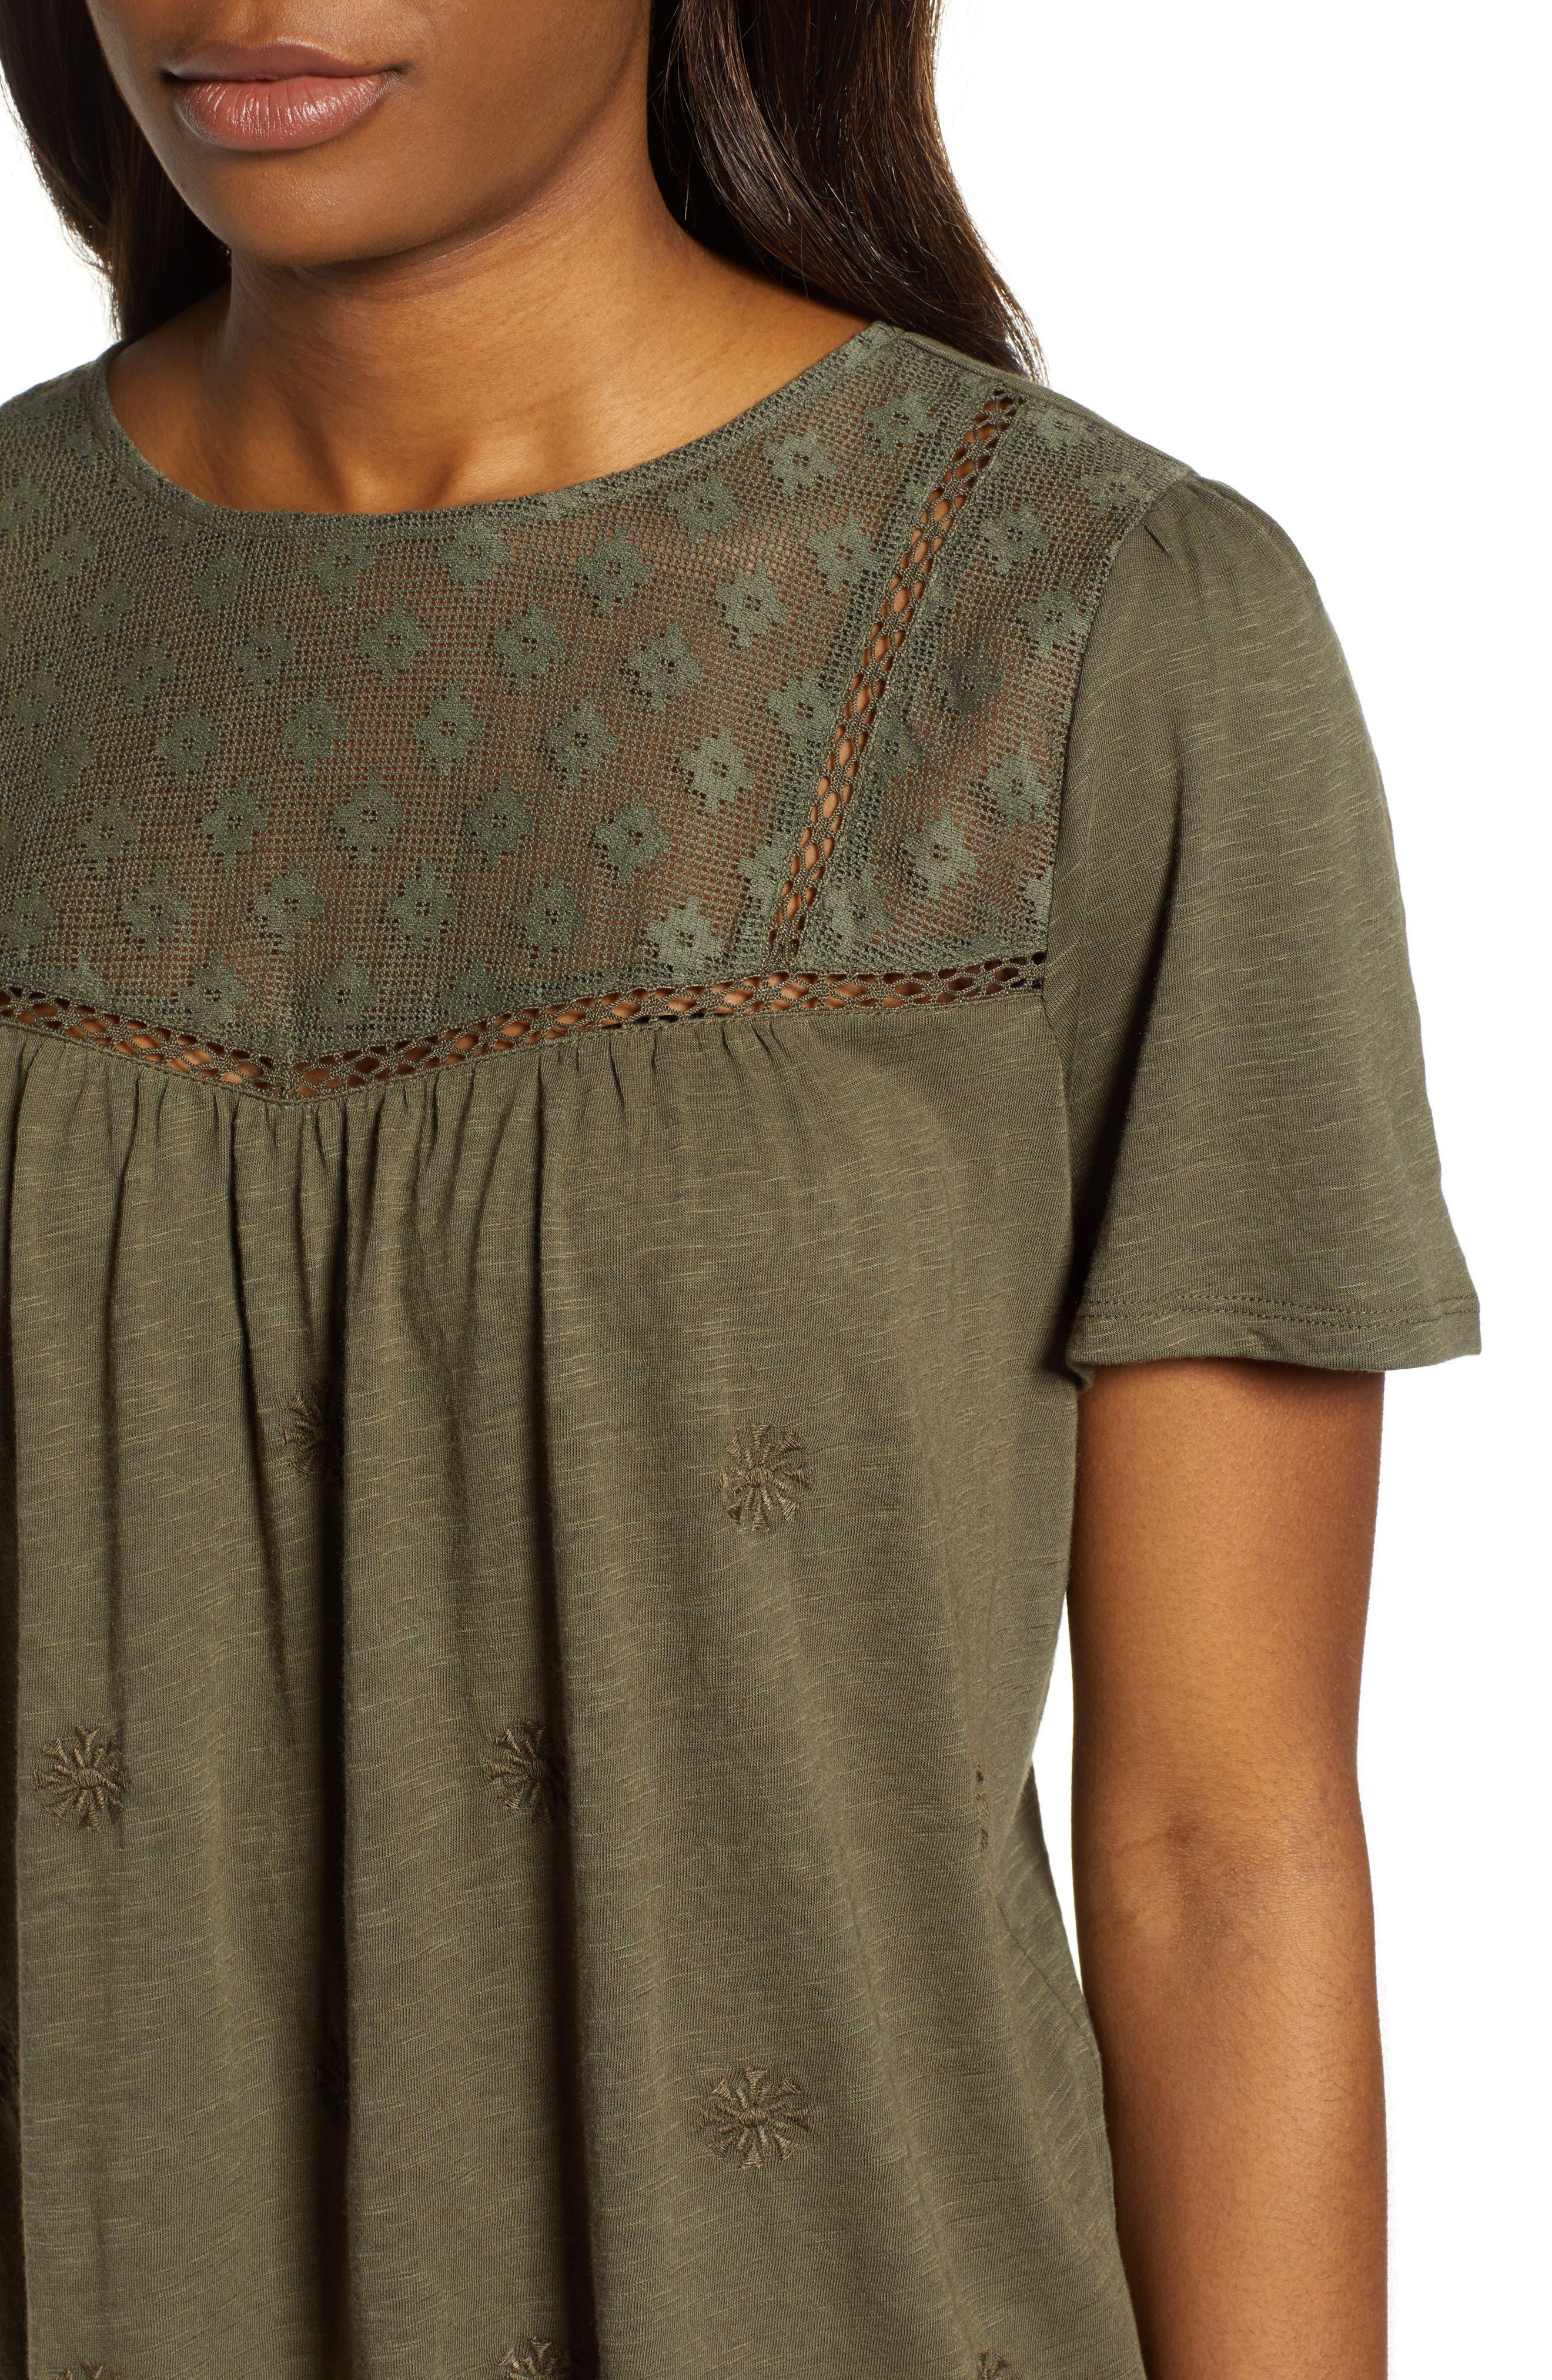 CASLON<SUP>®</SUP>, Embroidered Mesh Yoke Top, Alternate thumbnail 4, color, OLIVE SARMA